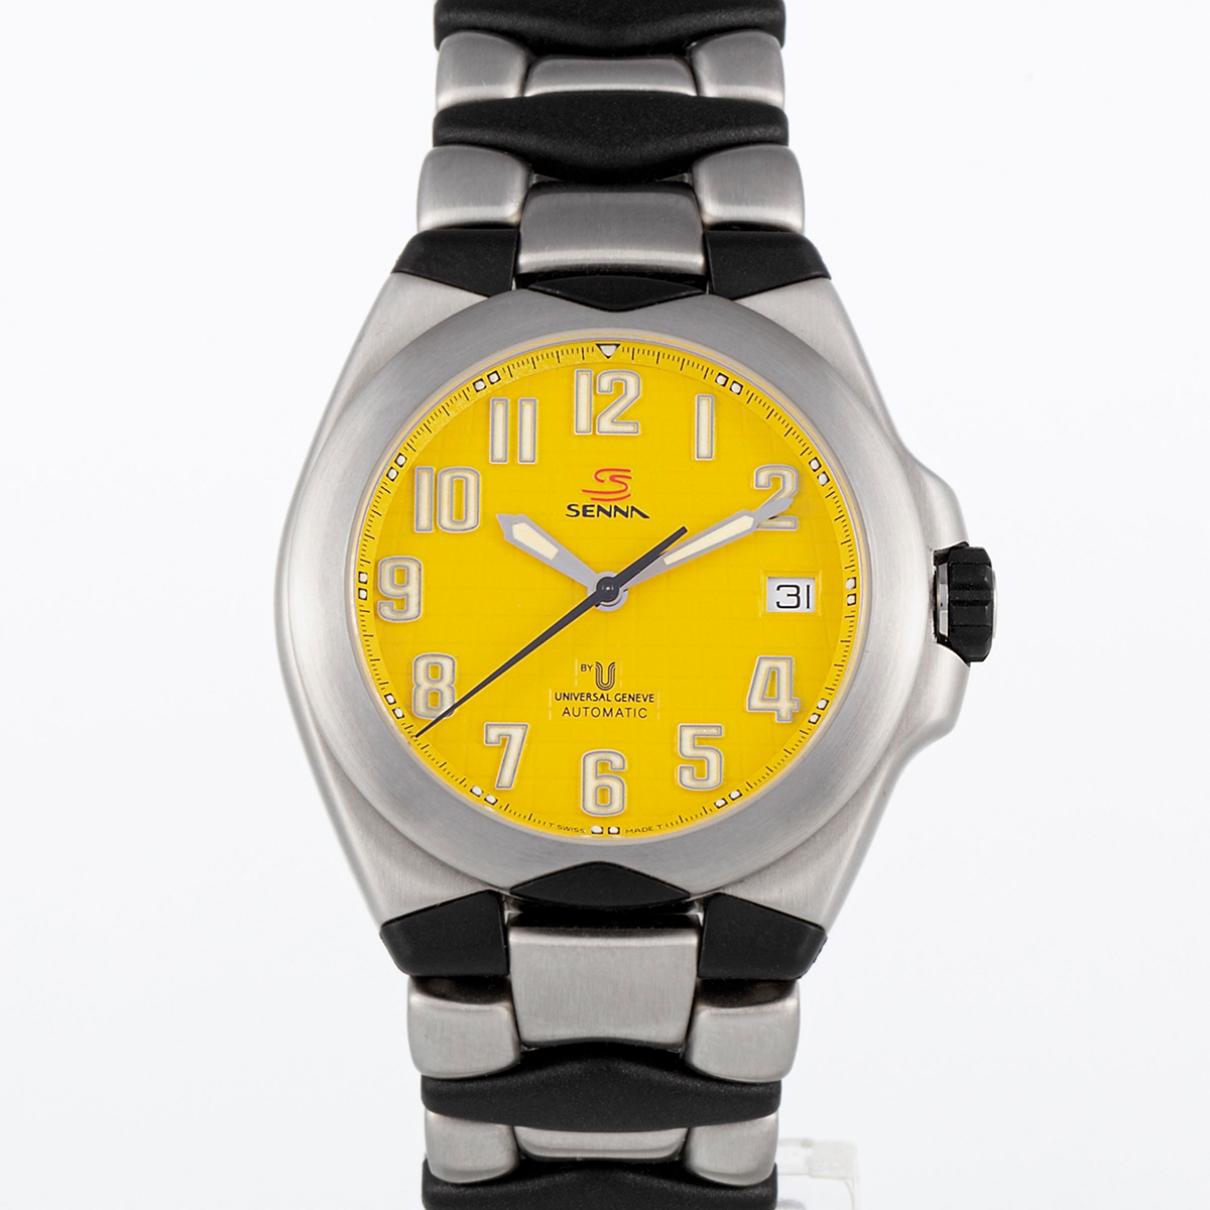 Relojes Universal Geneve